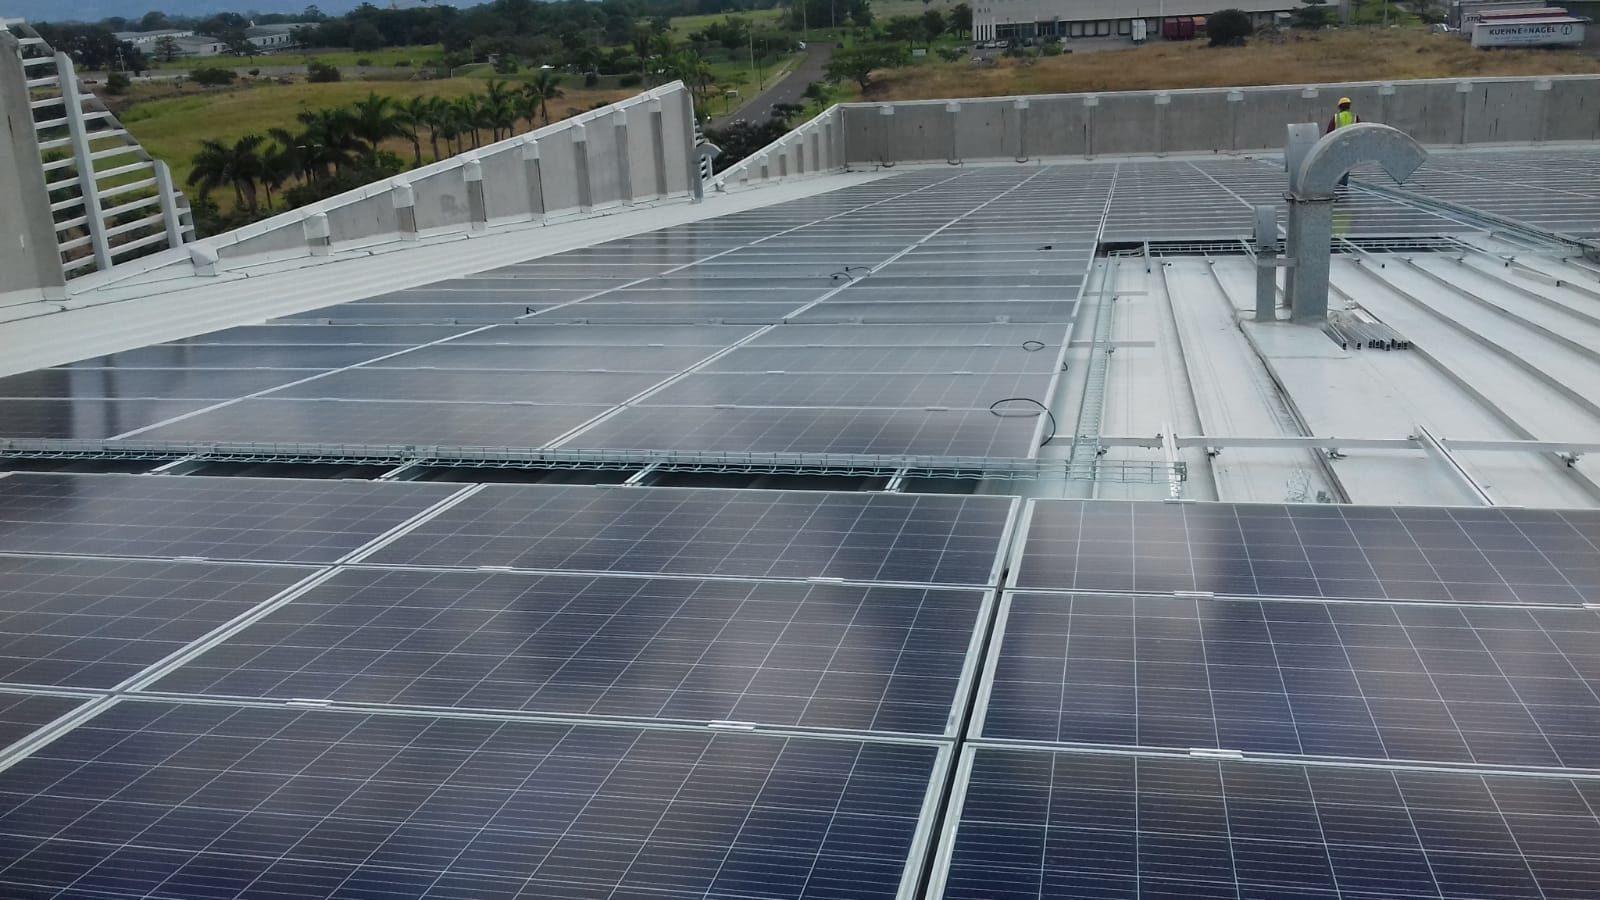 Photovoltaic solar installation on deck: 488 kWp (Costa Rica)